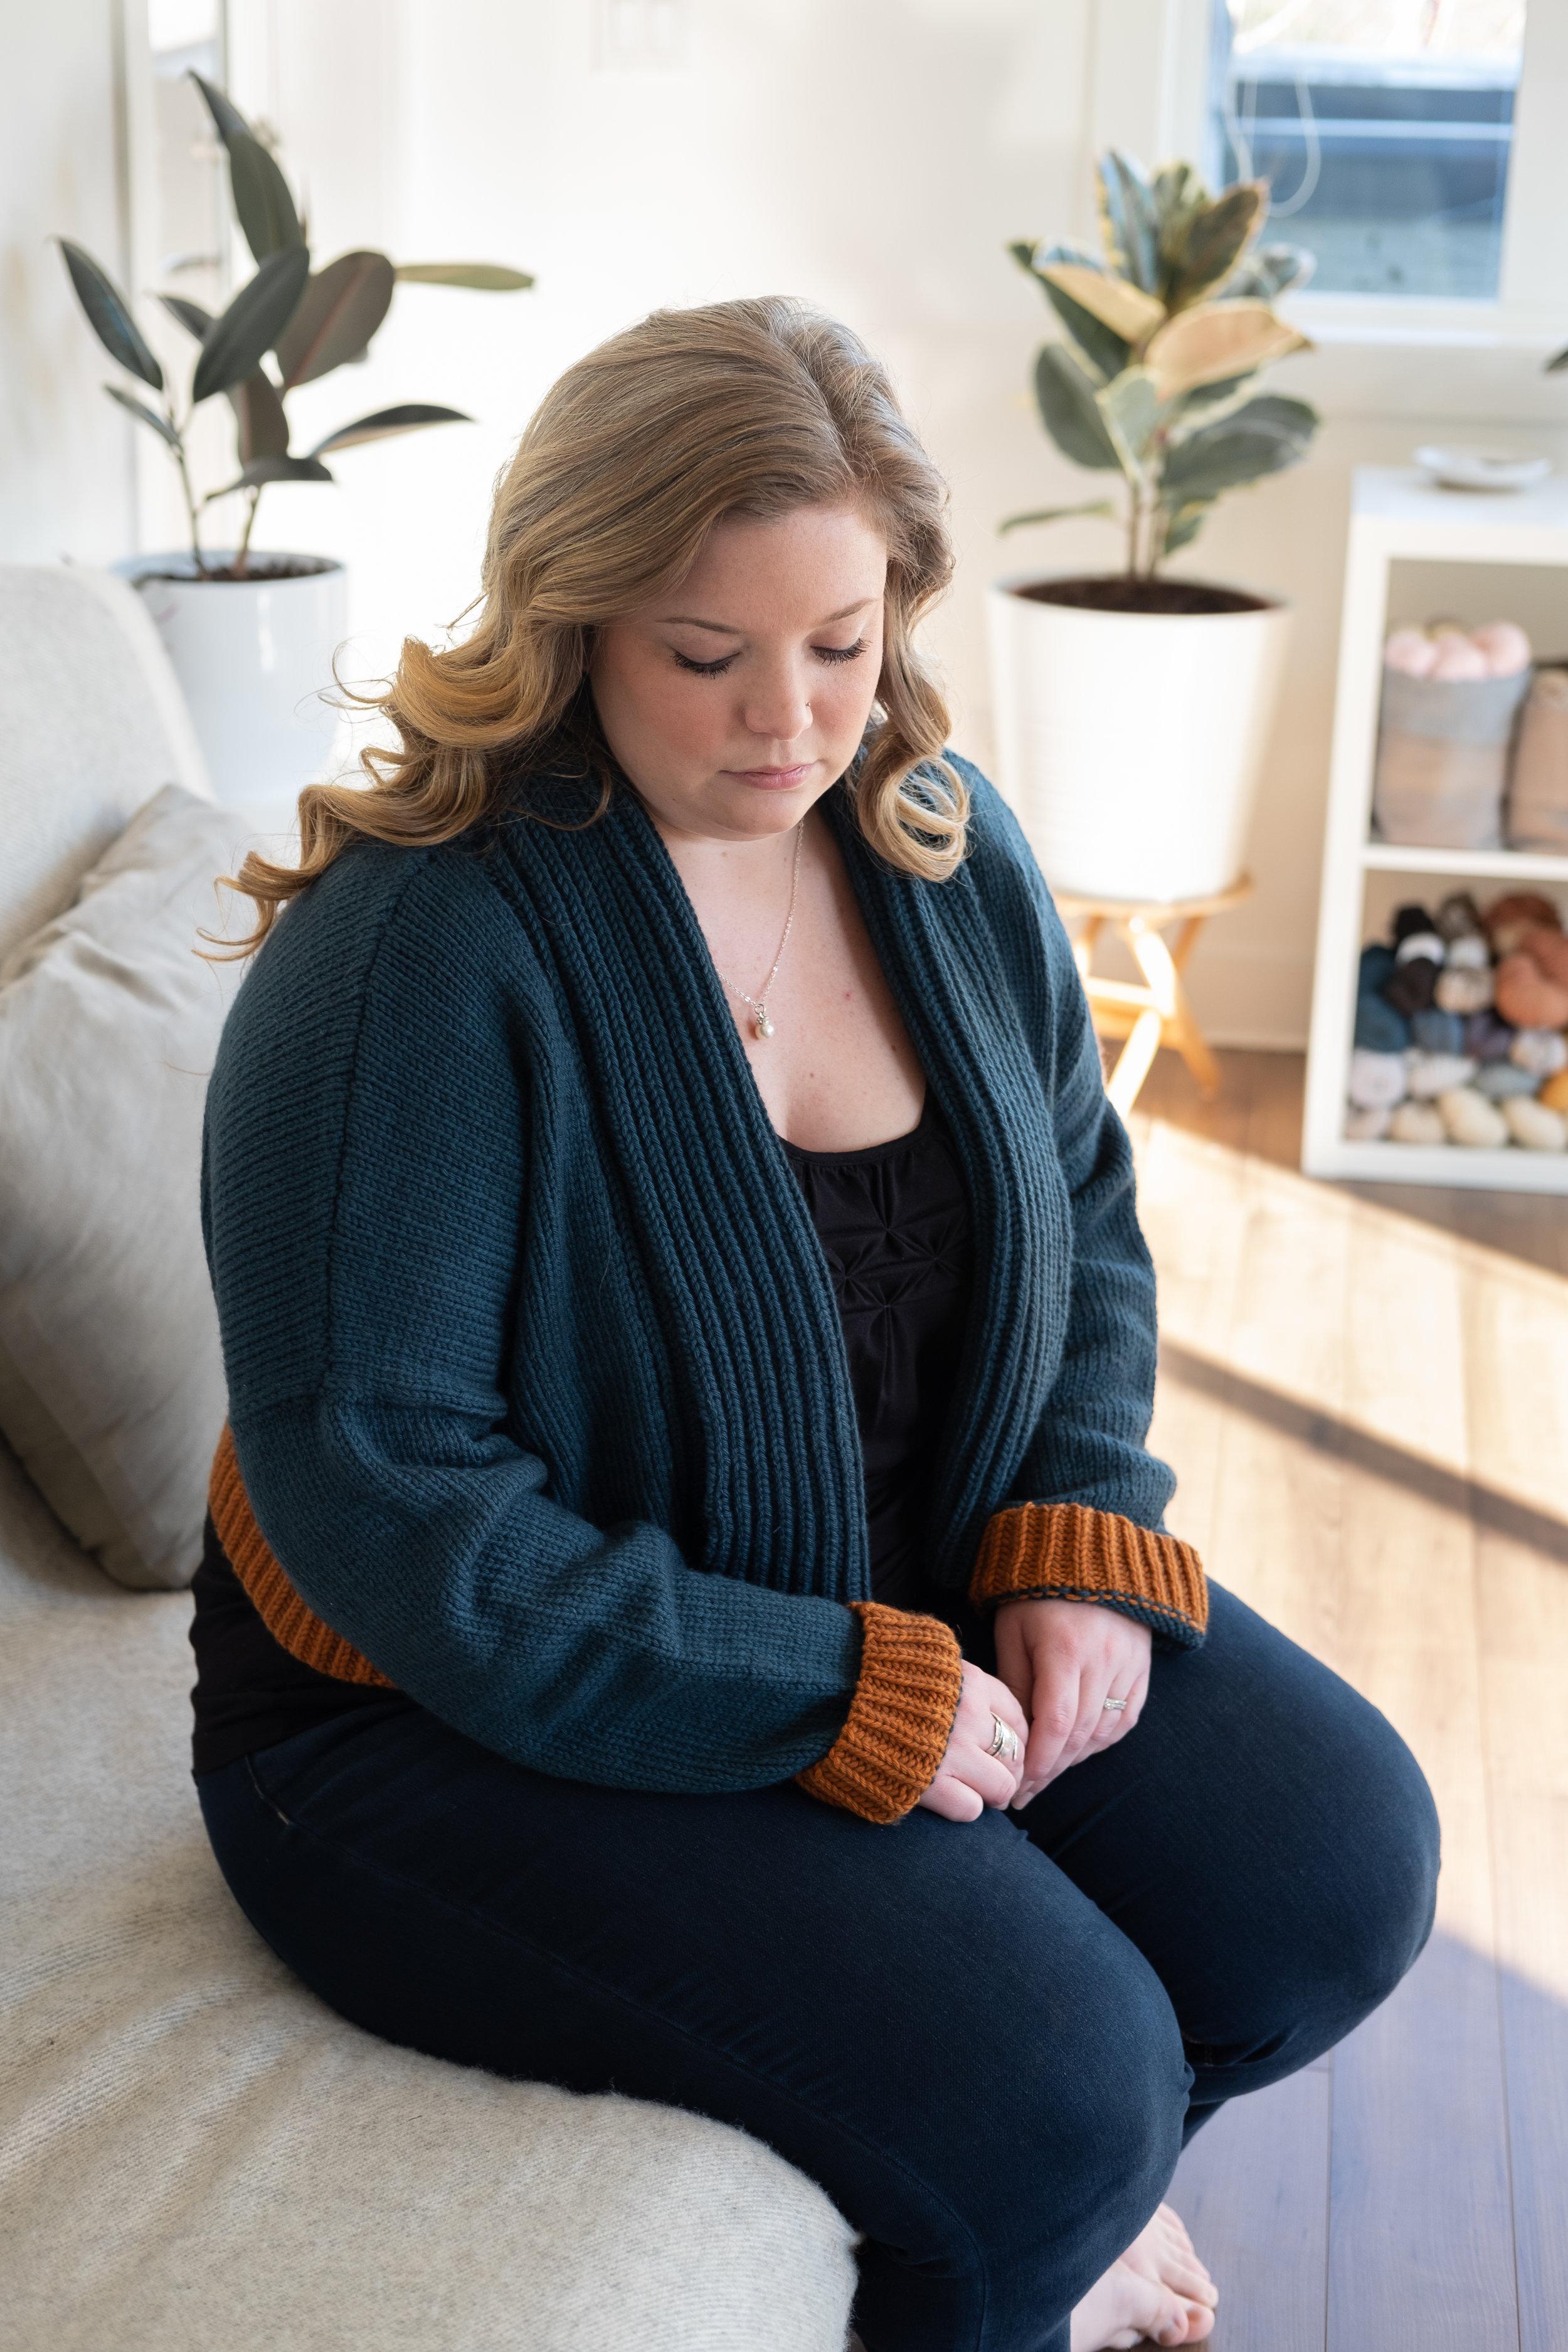 Larissa wearing Gilwell cardigan sits looking down.